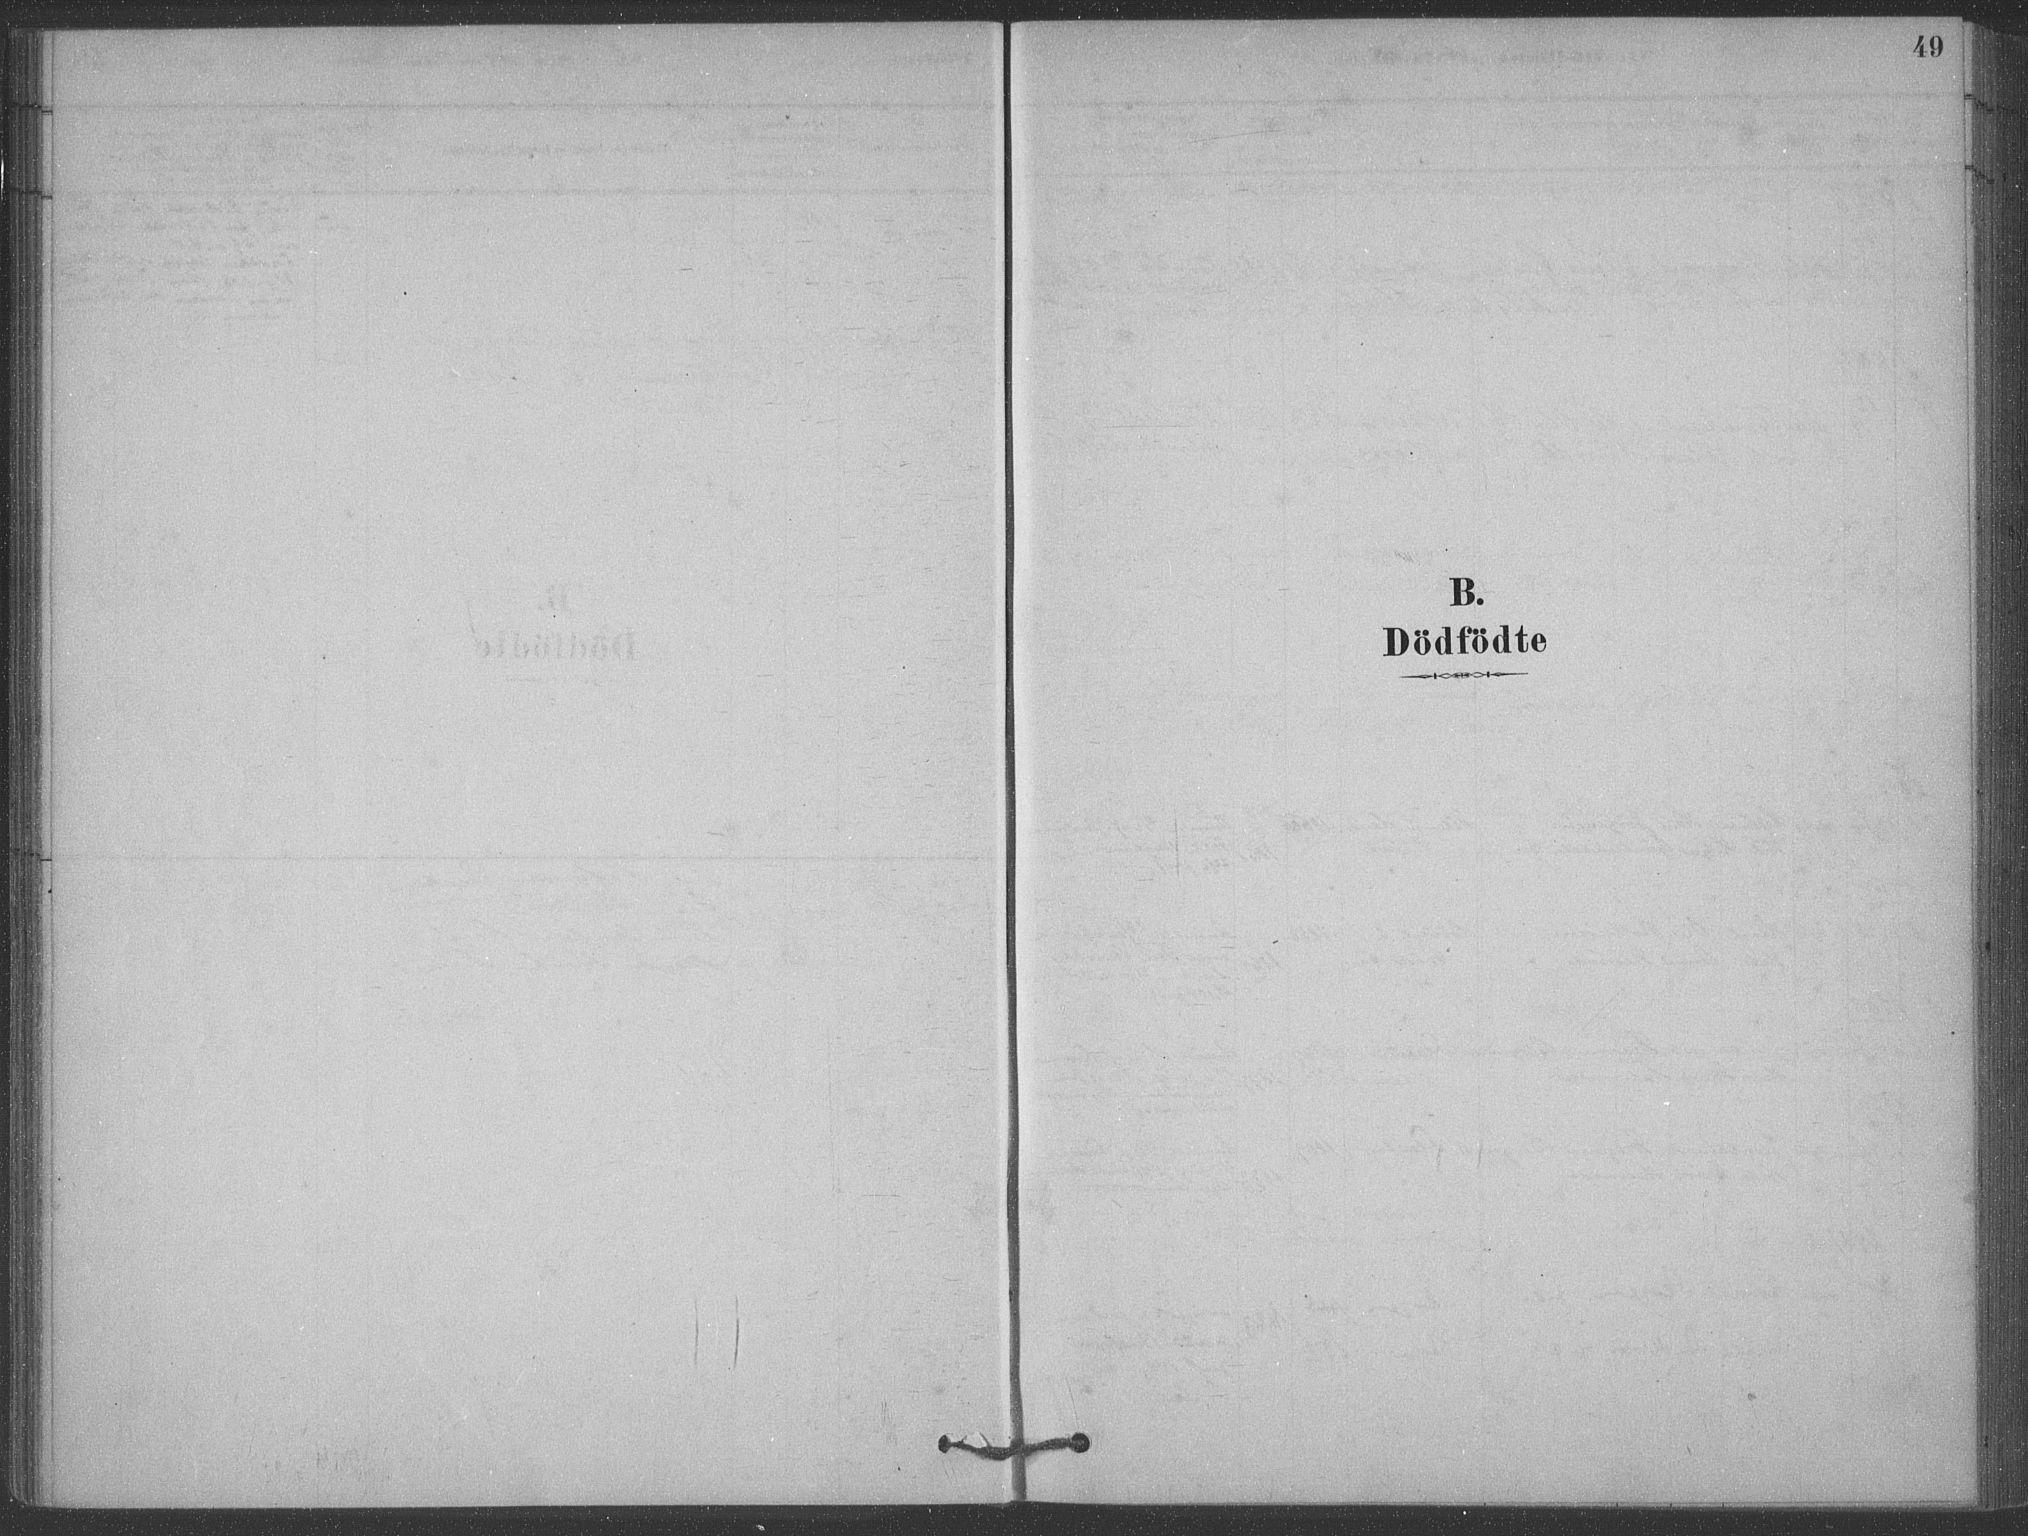 SAKO, Heddal kirkebøker, F/Fb/L0002: Ministerialbok nr. II 2, 1878-1913, s. 49